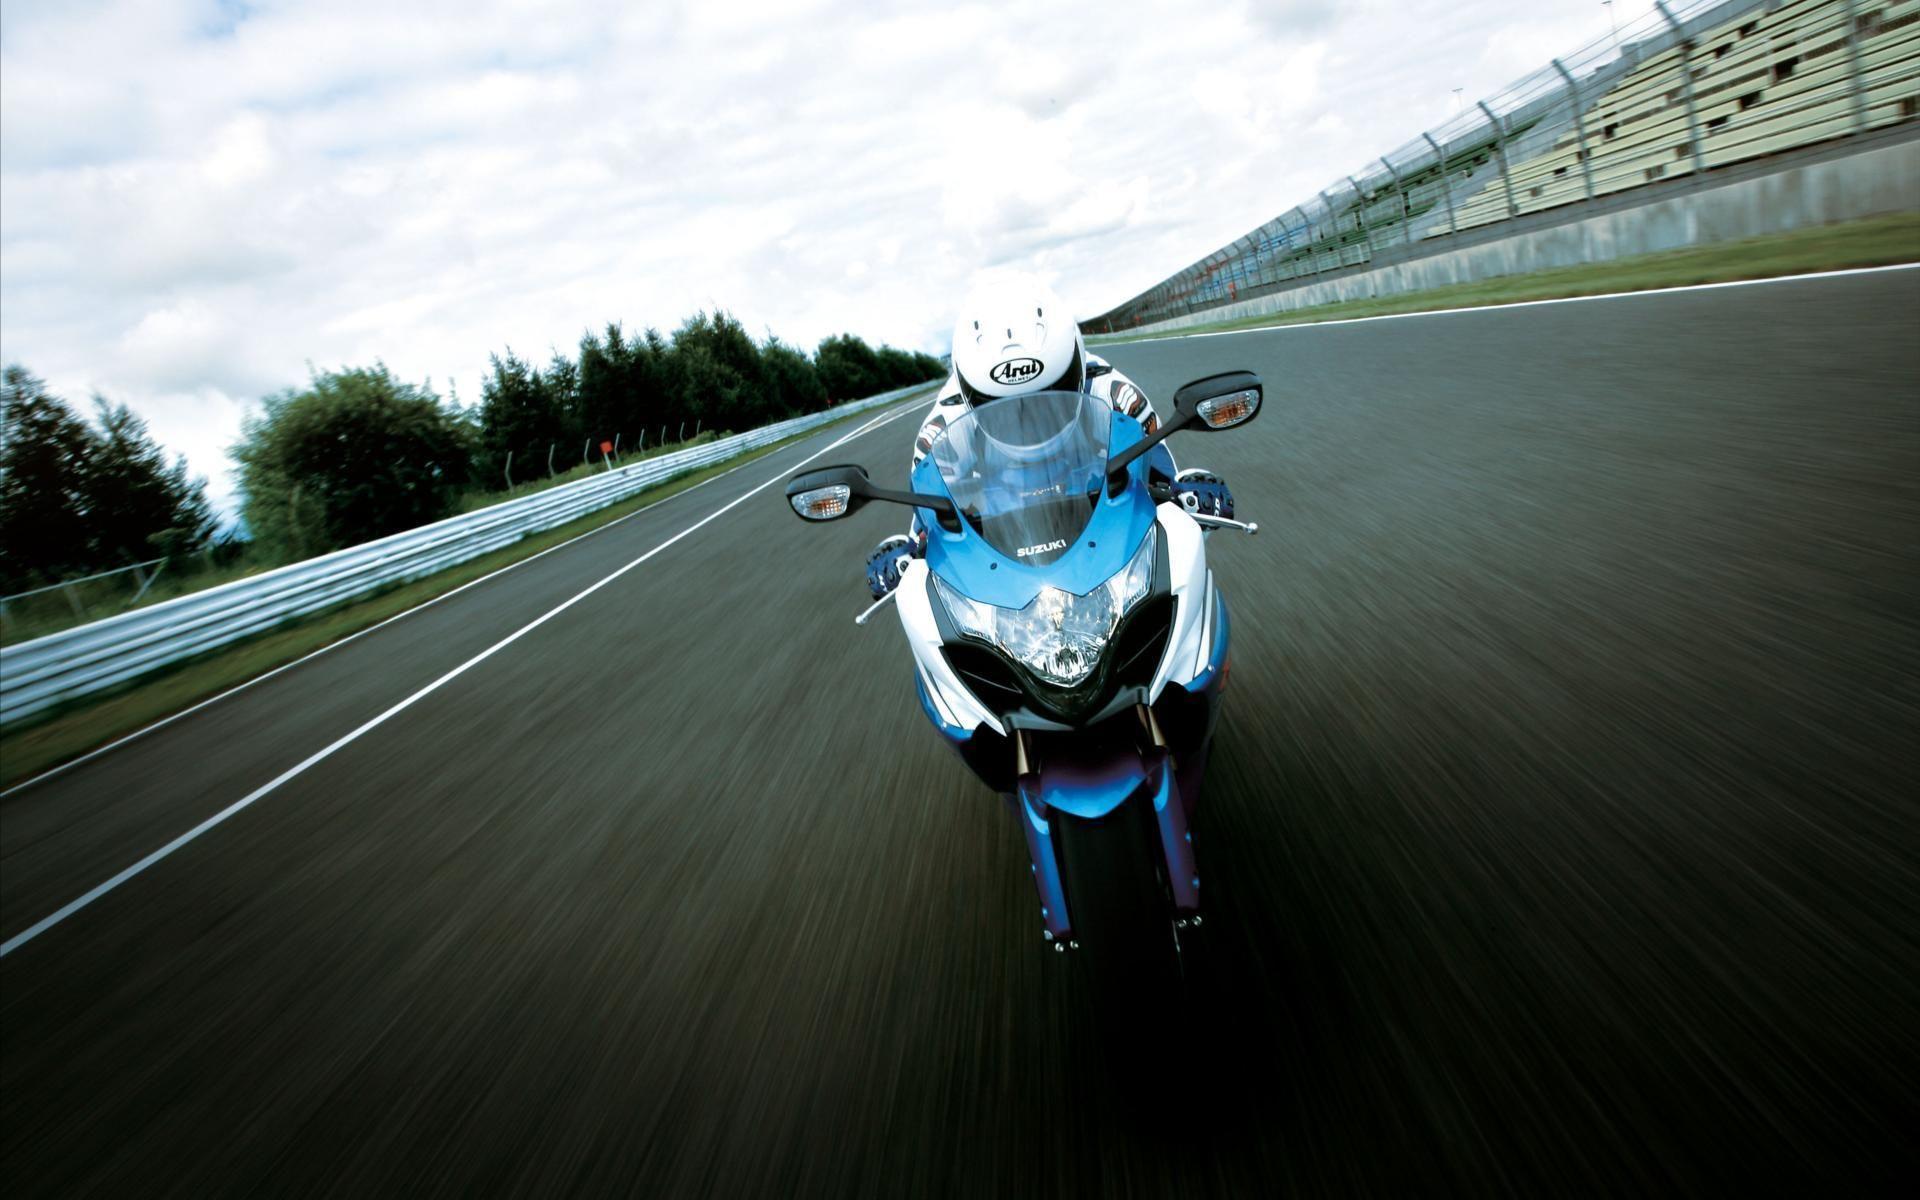 suzuki racing bike wallpapers | motorcycle | pinterest | racing bike